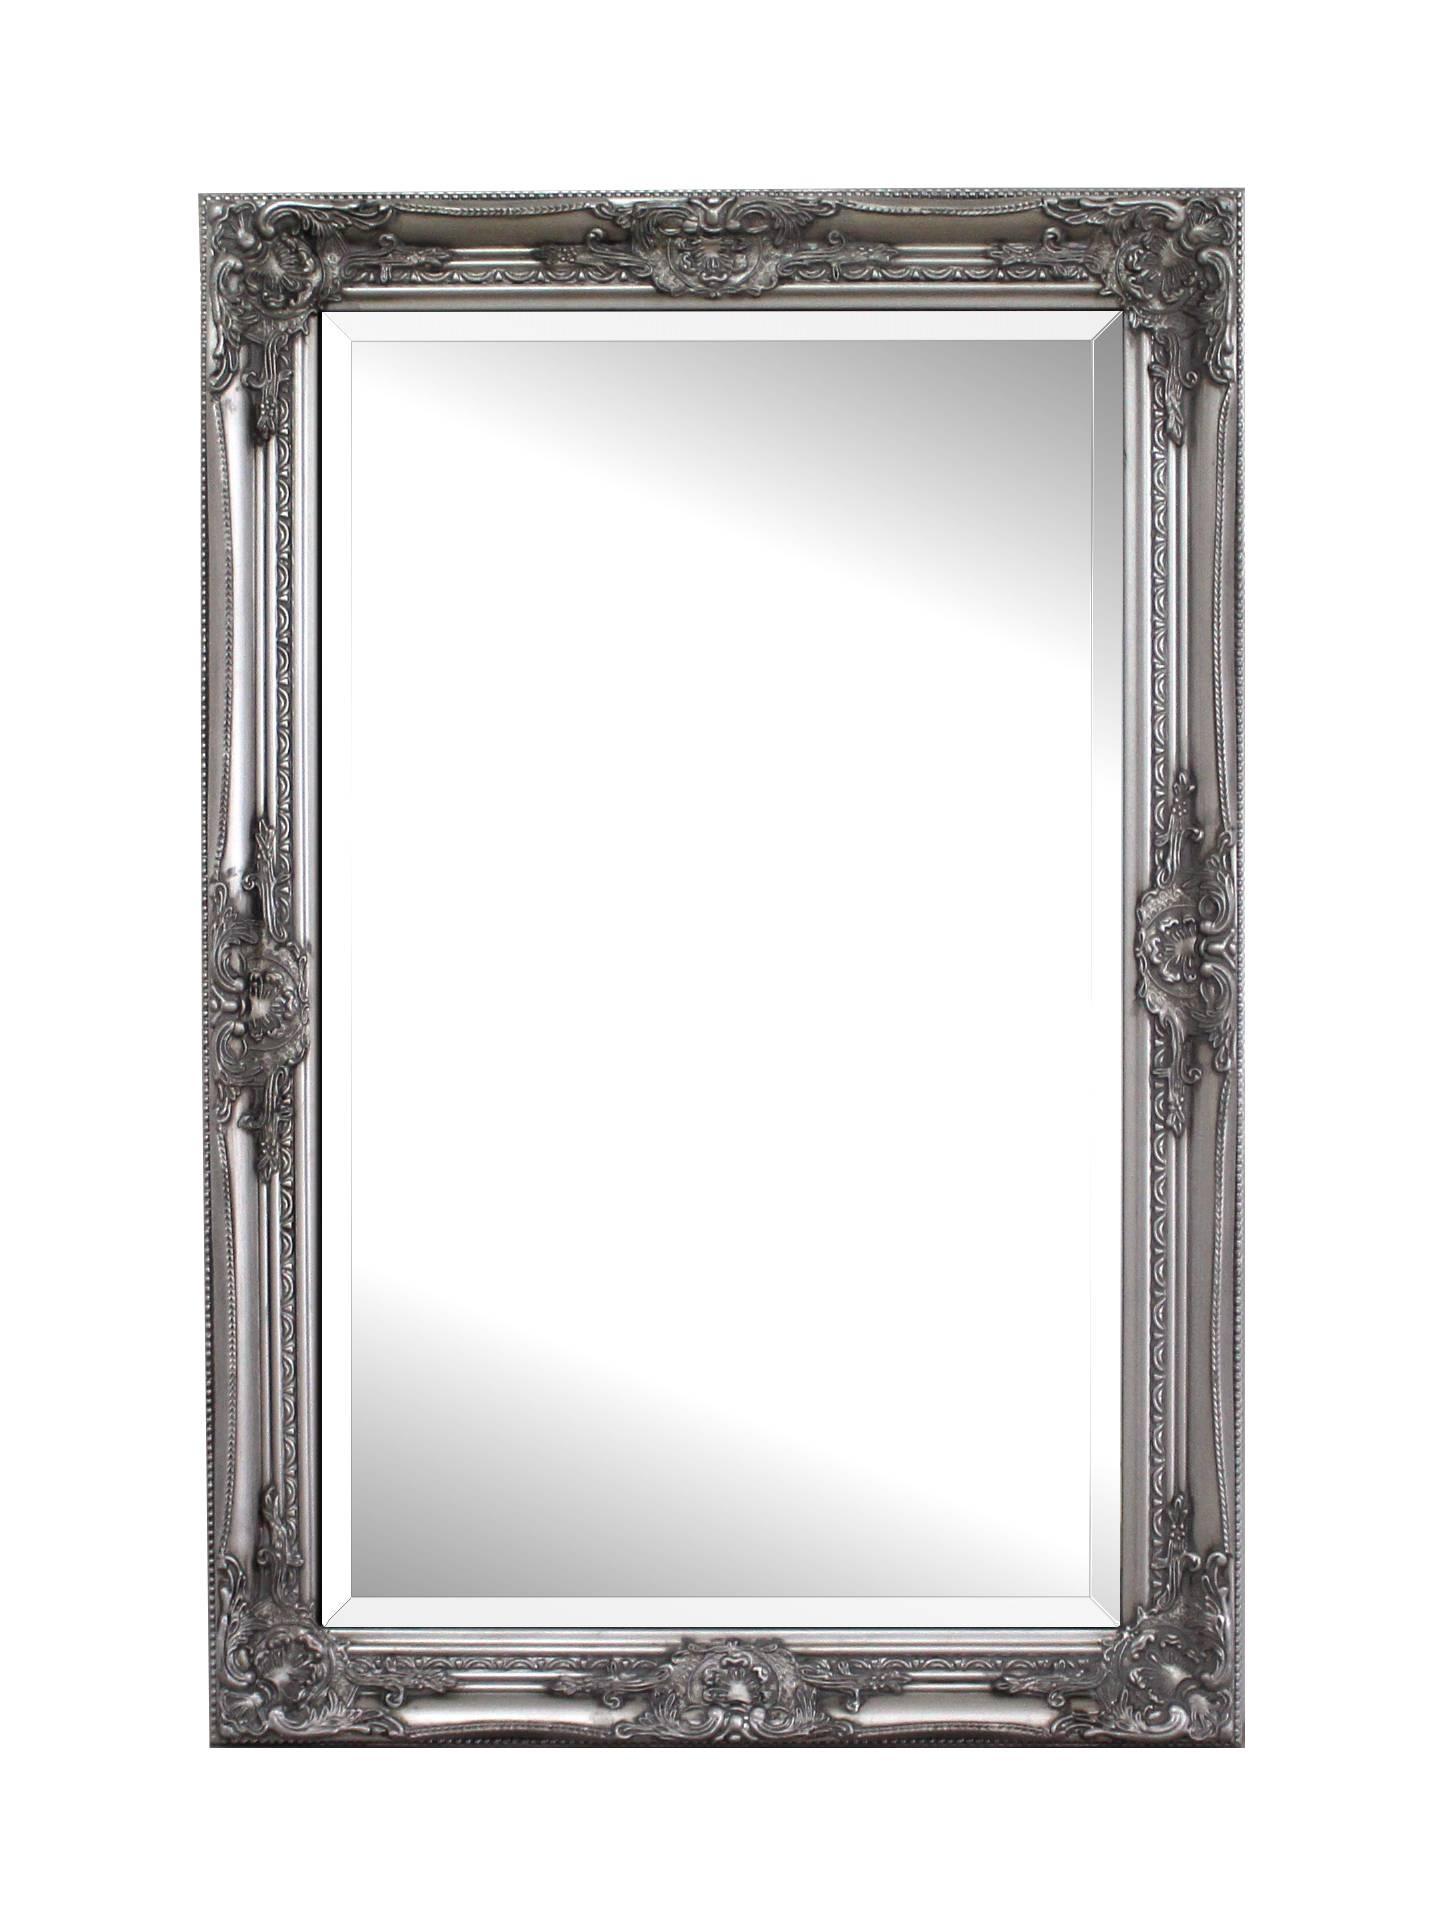 Inner Reflectioncasa Chic – Casa Chic Pertaining To Black Shabby Chic Mirrors (View 14 of 25)